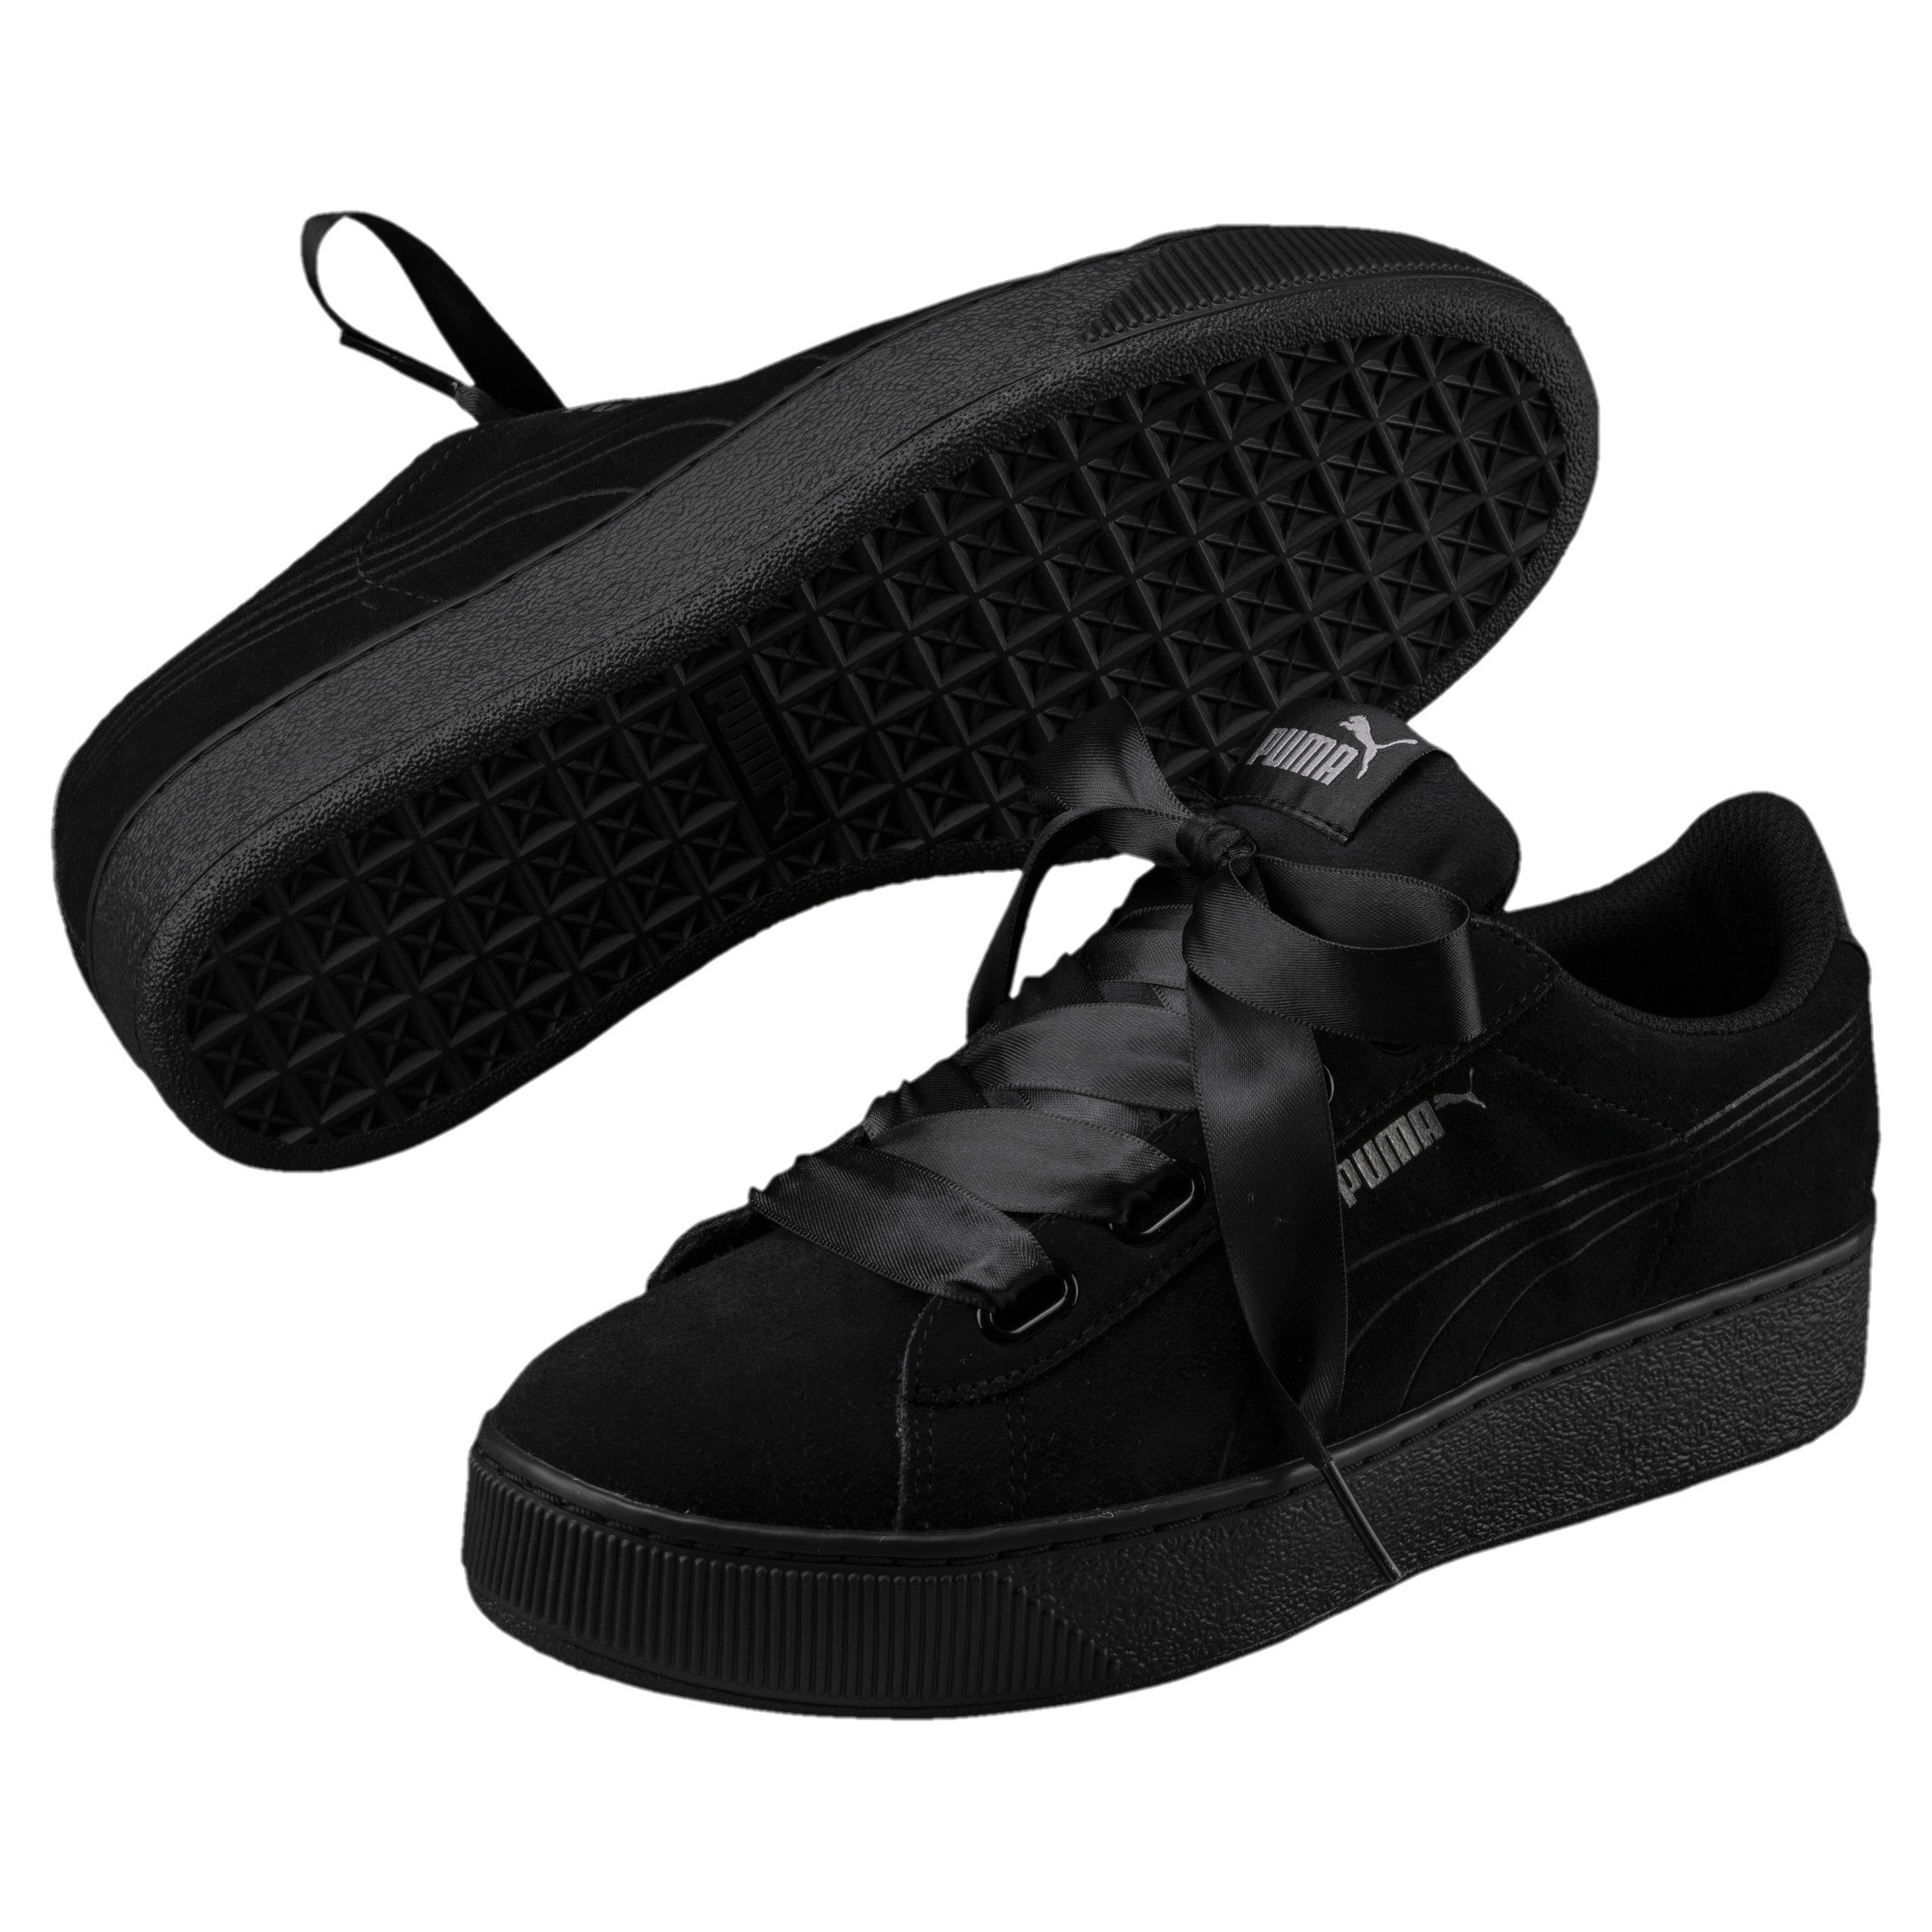 Sneakers80 Platform Puma Womens' Ribbon Vikky Blue wn0Ok8PX